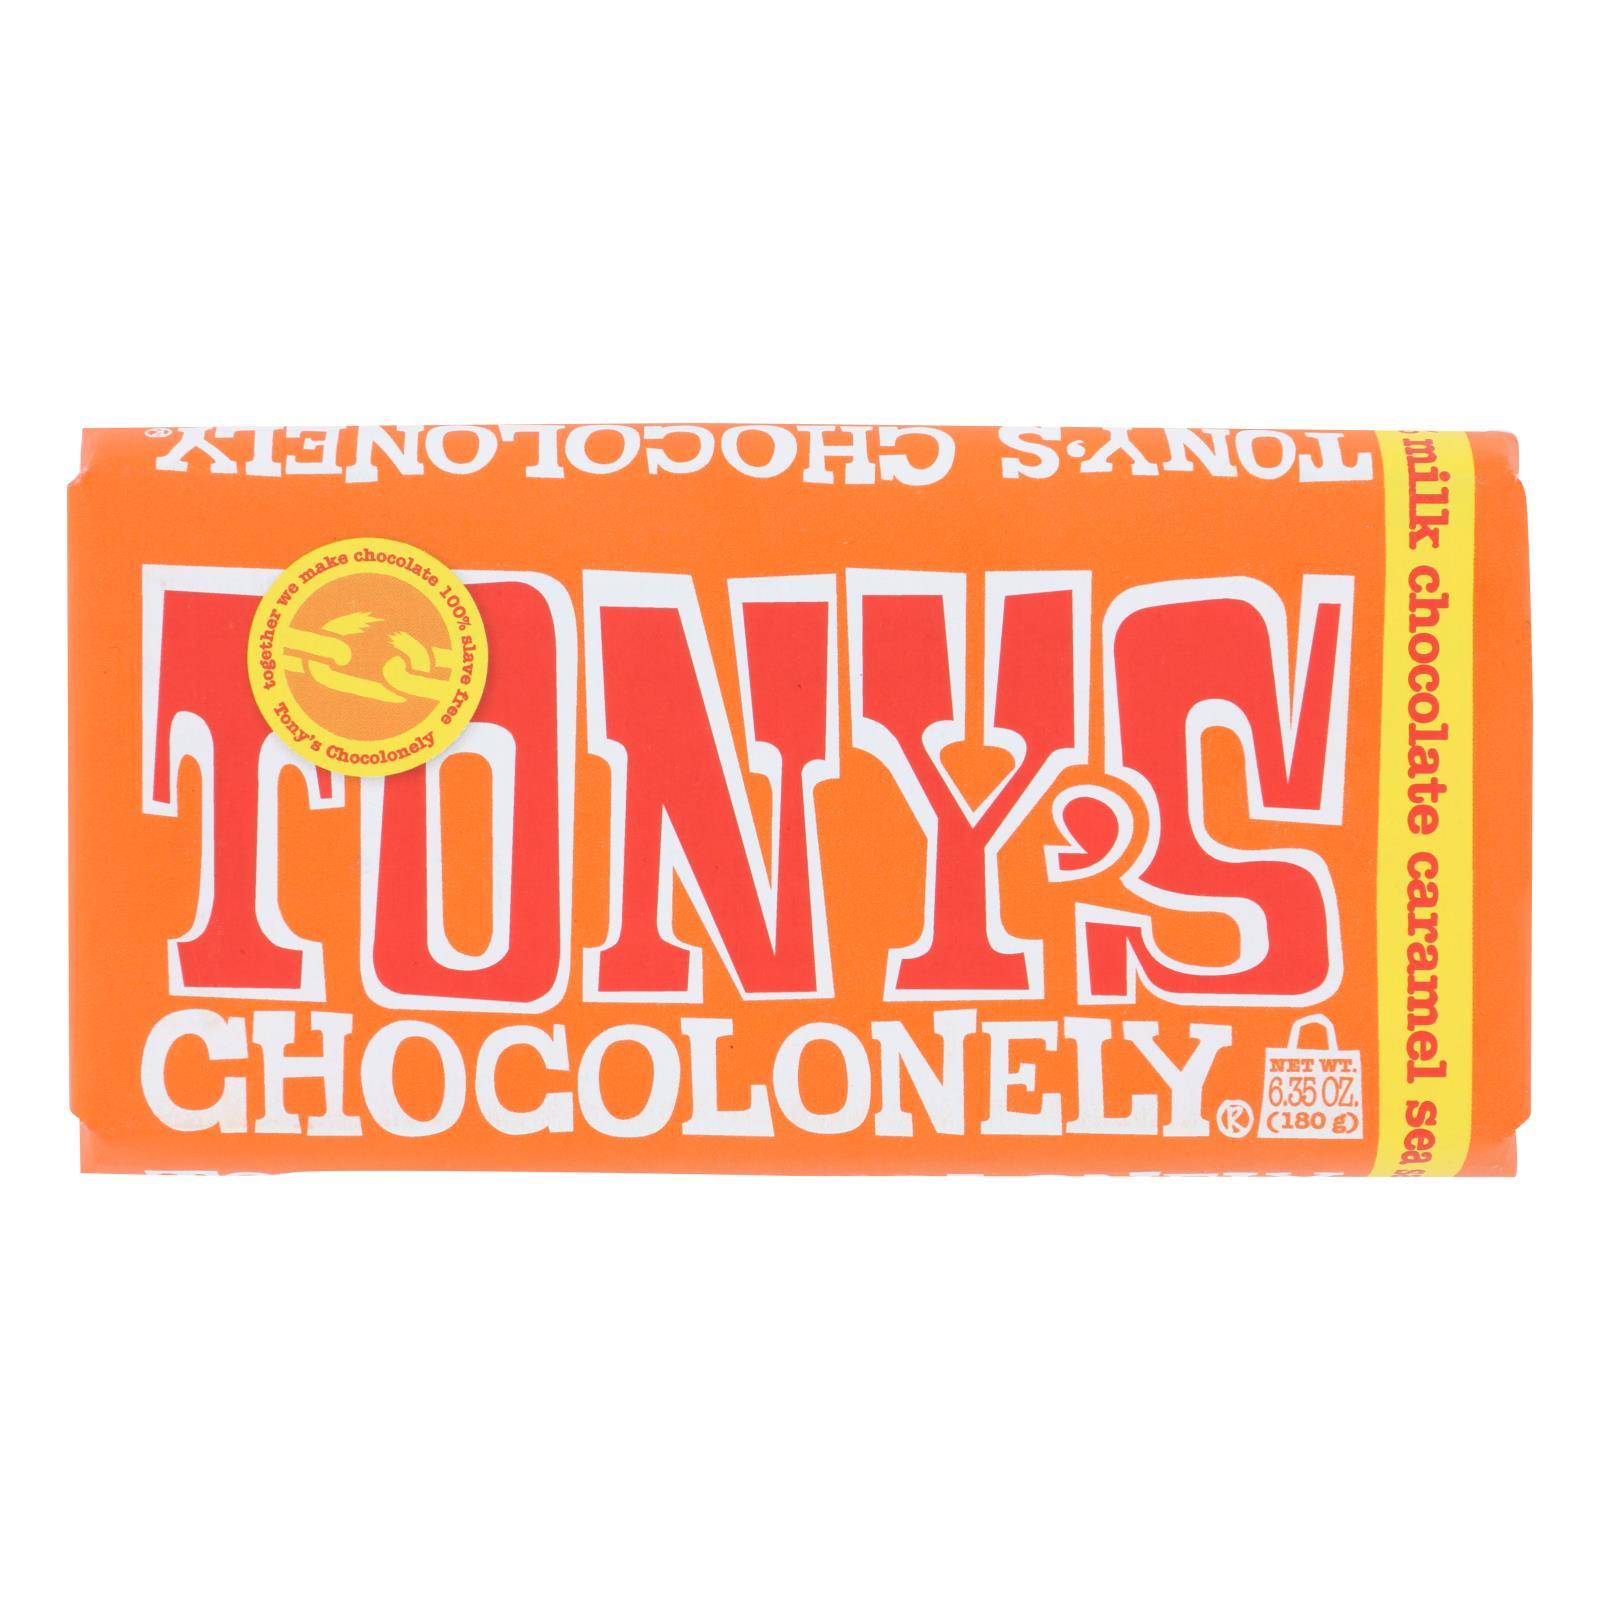 Tony's Chocolonely - Bar Chocolate Milk Caramel Ssl 32% - Case of 15 - 6.35 OZ